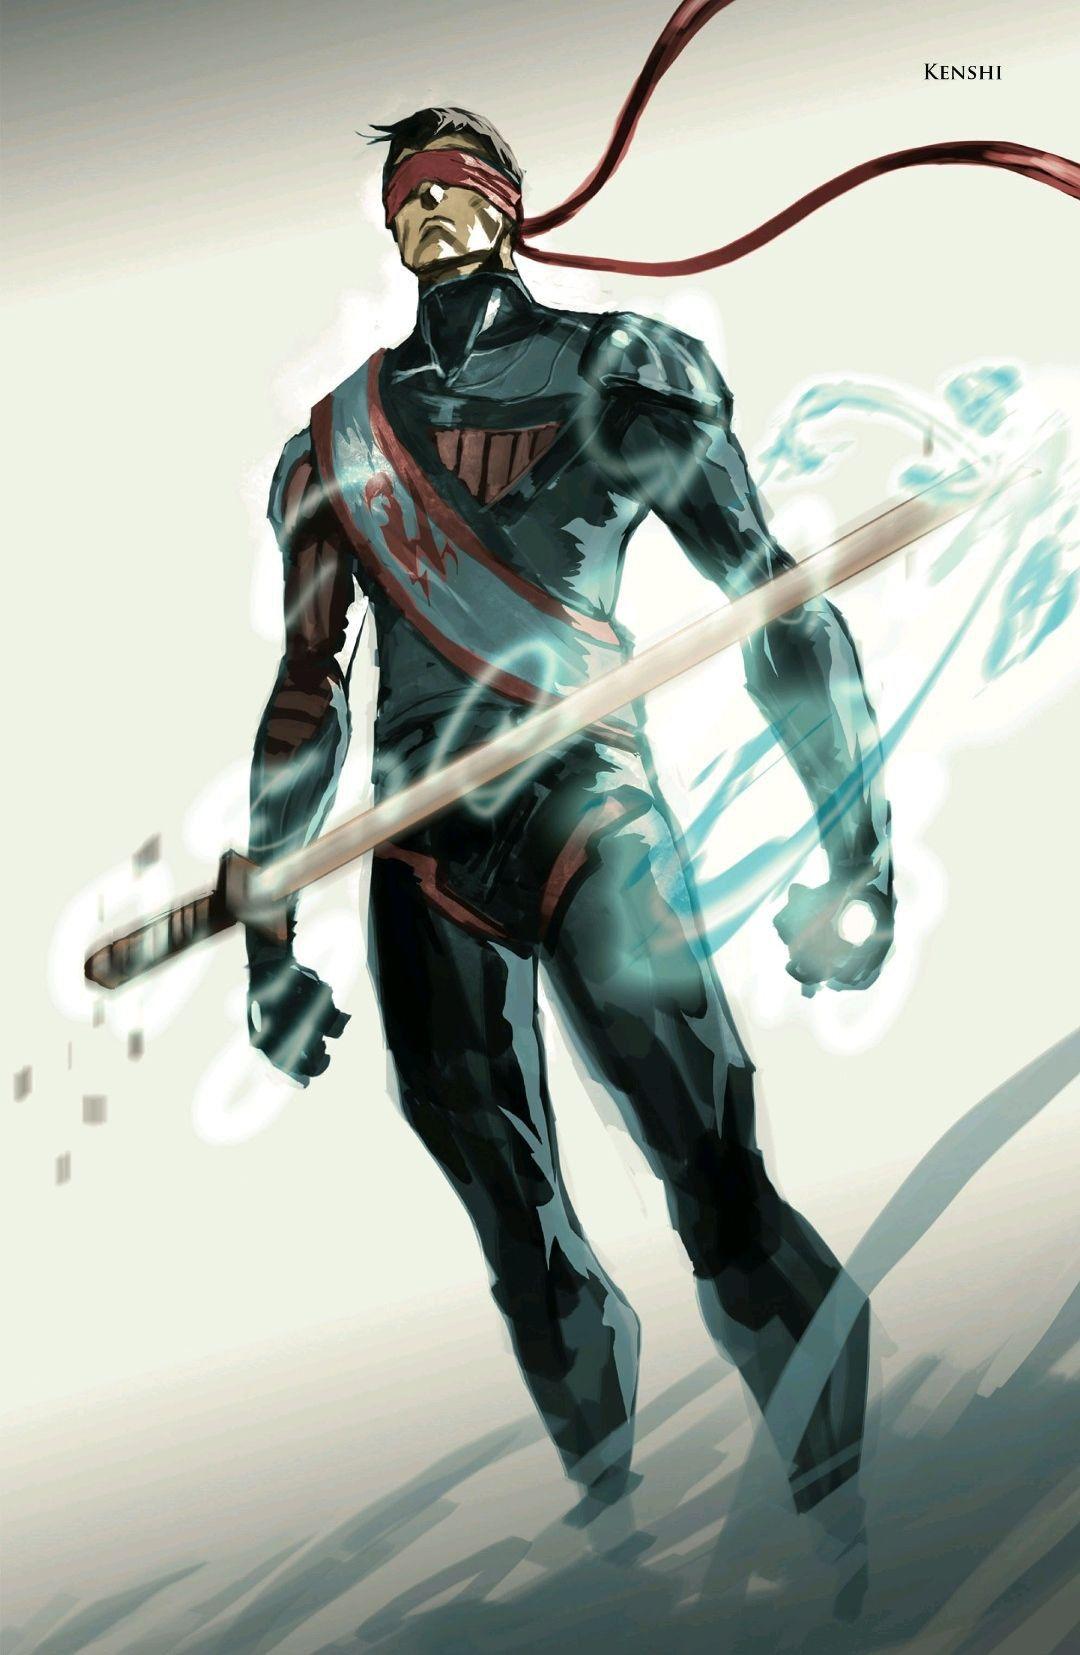 Mortal Kombat x Readers - Kenshi x Reader x Scorpion P1